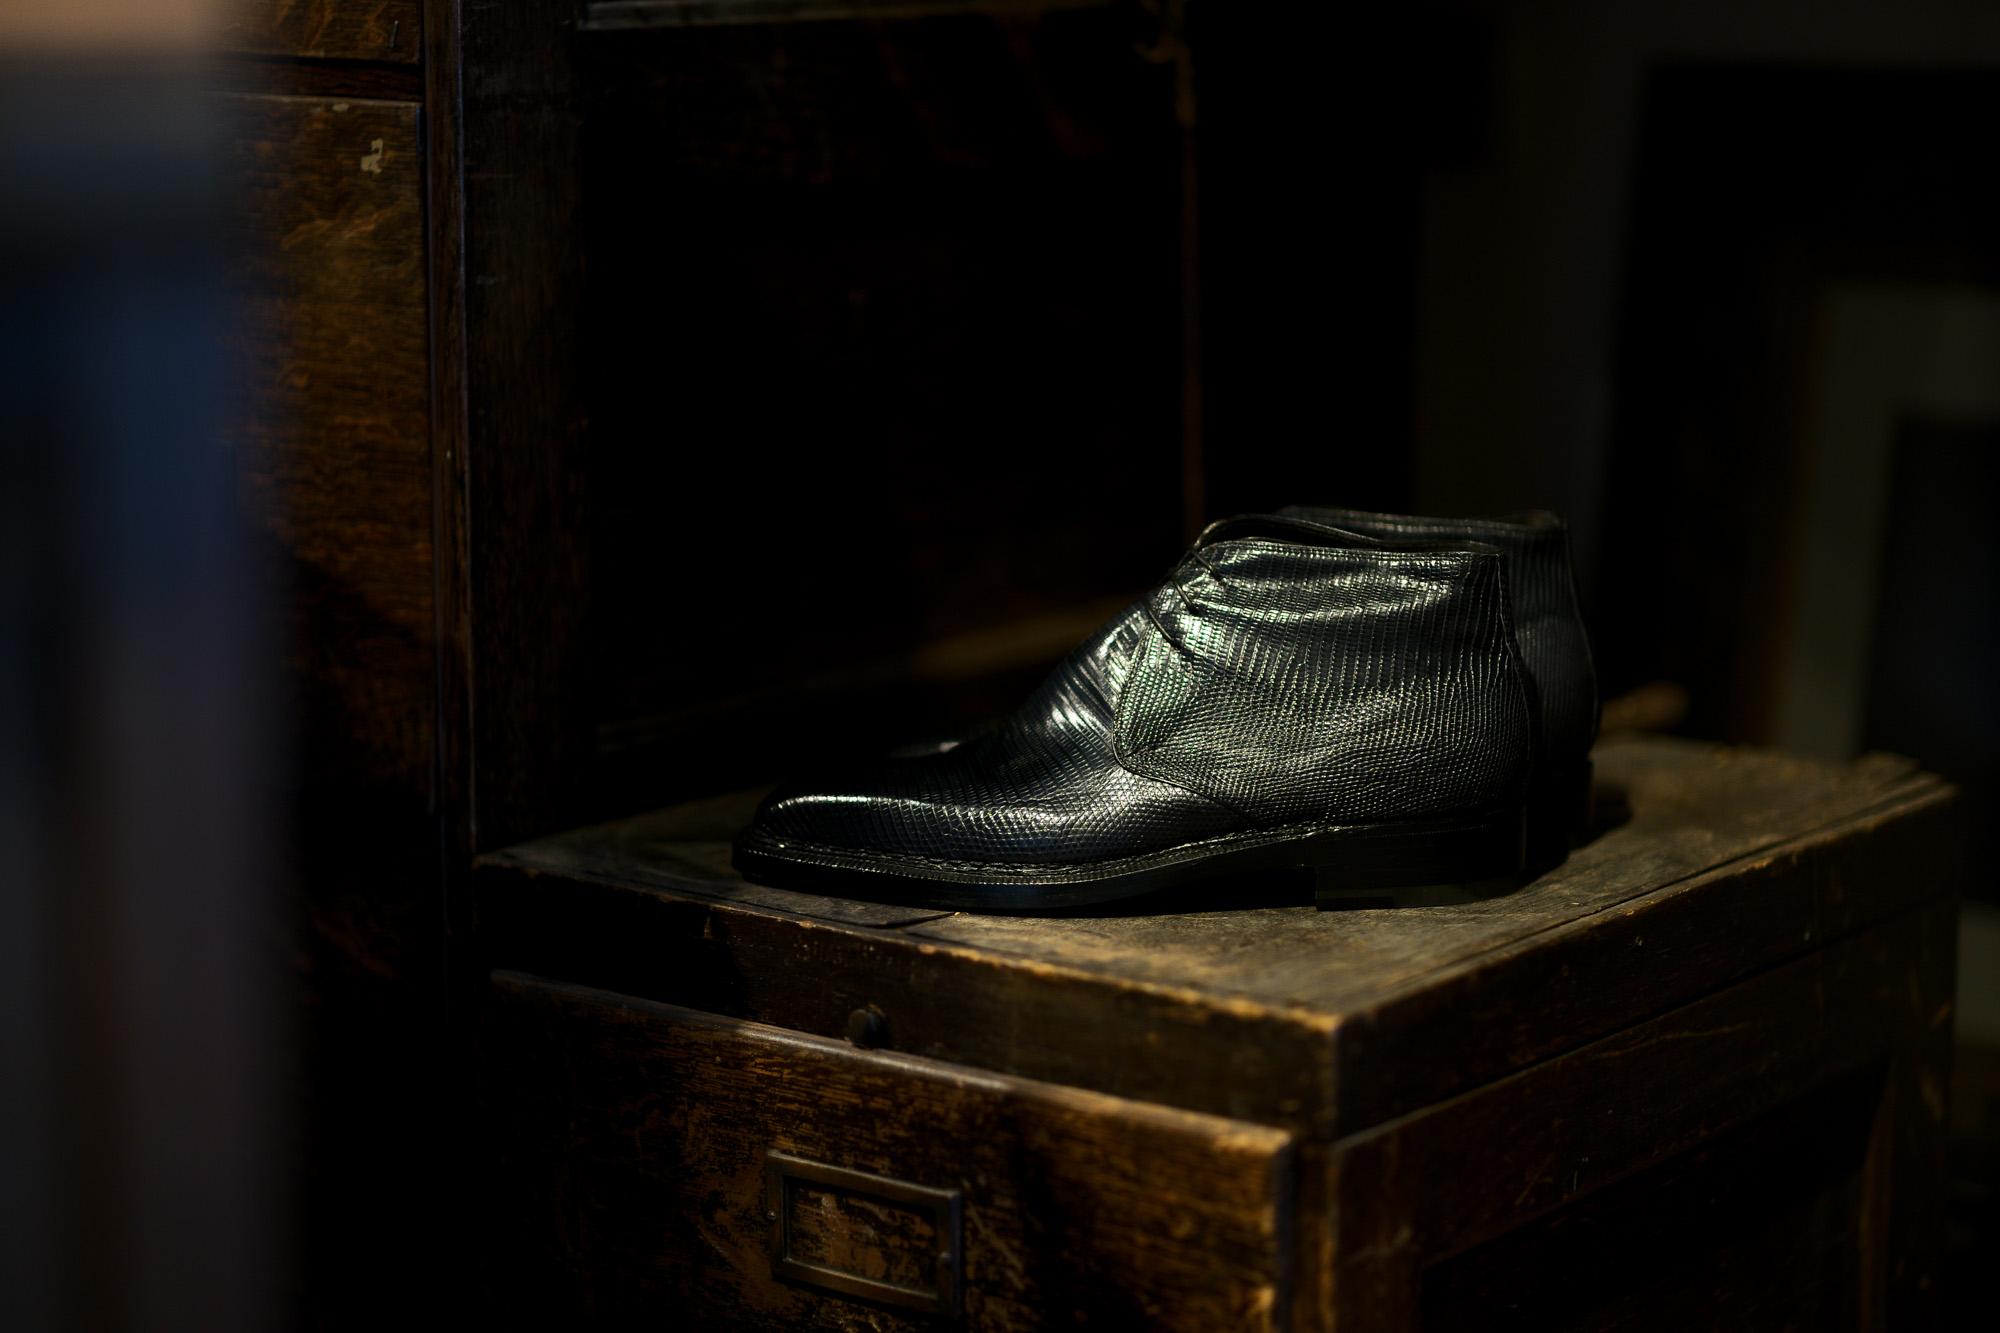 "ENZO BONAFE ""ART.3722"" Chukka boots LIZARD BLUE 2021 【Special Model】ENZO BONAFE (エンツォボナフェ) ART.3722 Chukka boots LIZARD (リザード) リザードレザー チャッカブーツ BLUE (ブルー) made in italy (イタリア製) 2021 愛知 名古屋 Alto e Diritto altoediritto アルトエデリット"